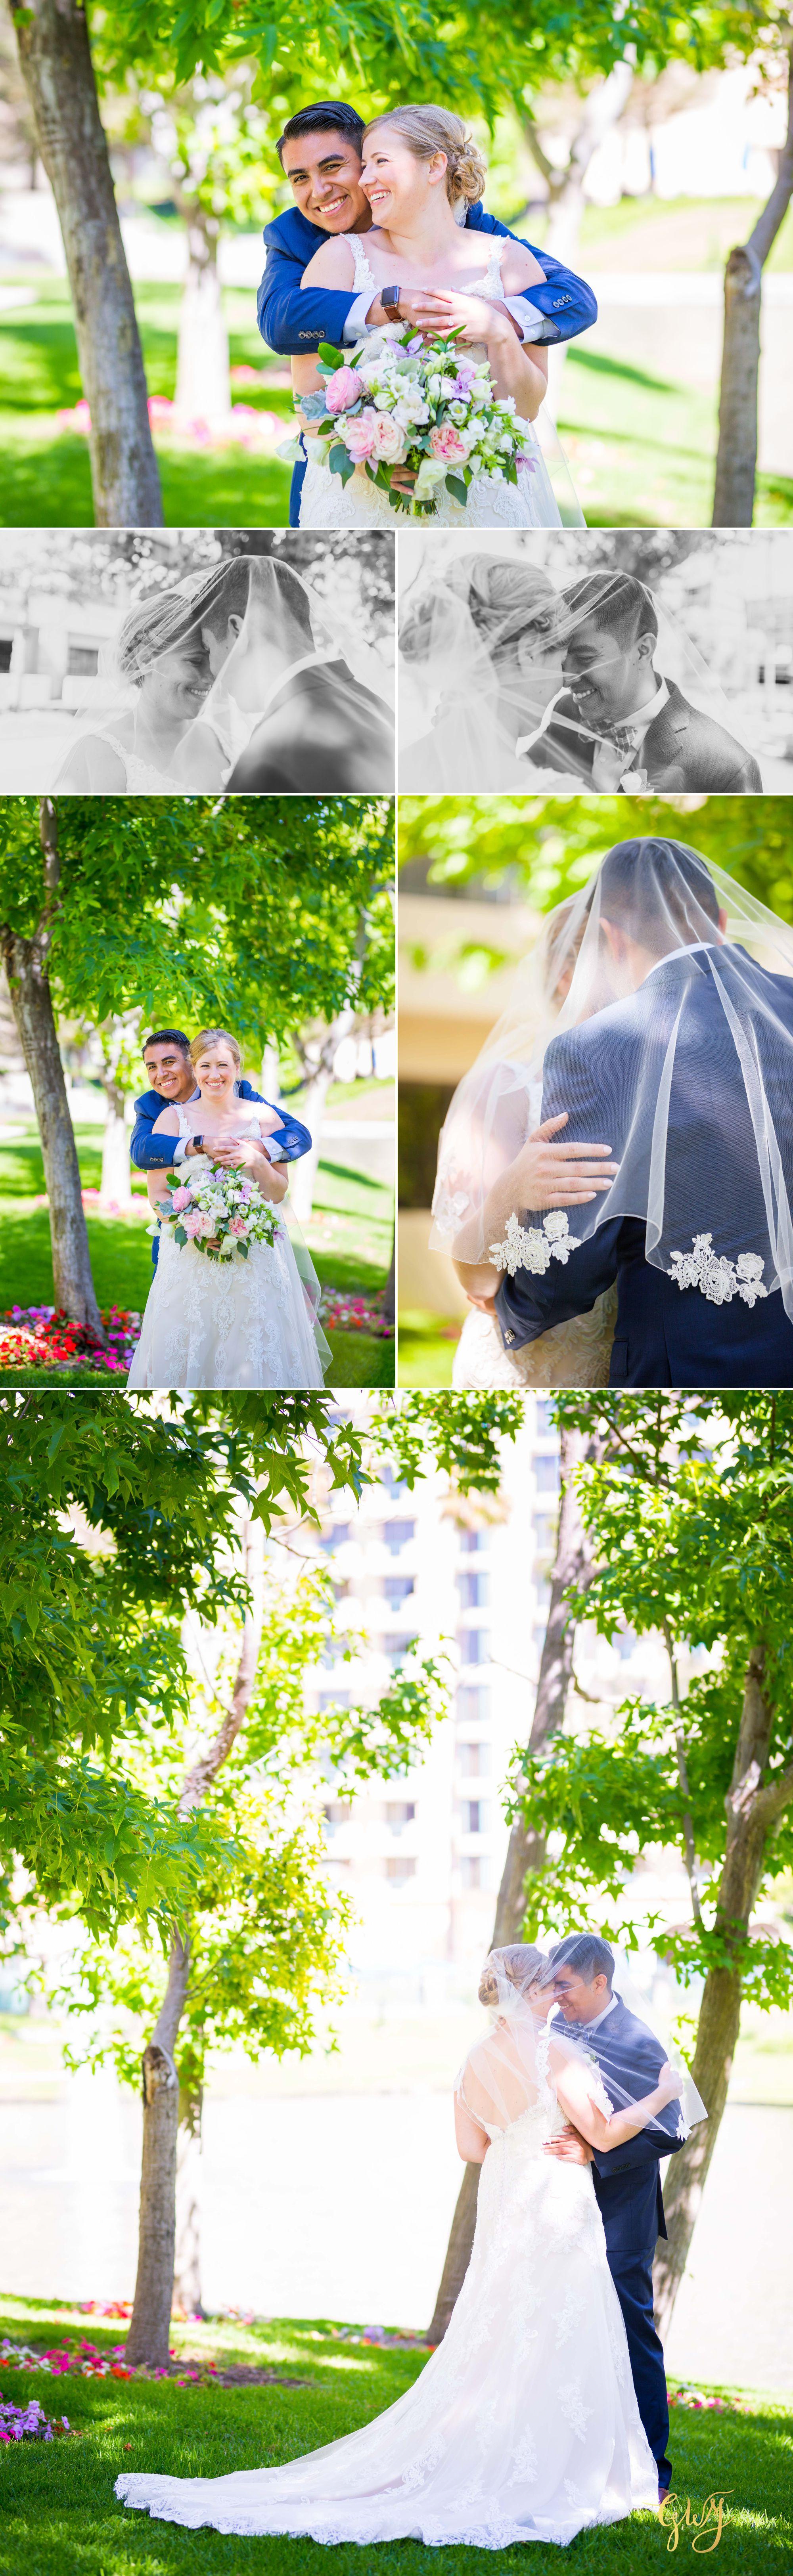 Javier + Kari Avenue of the Arts First Look Vintage Rose Wedding Ceremony Reception by Glass Woods Media 12.jpg